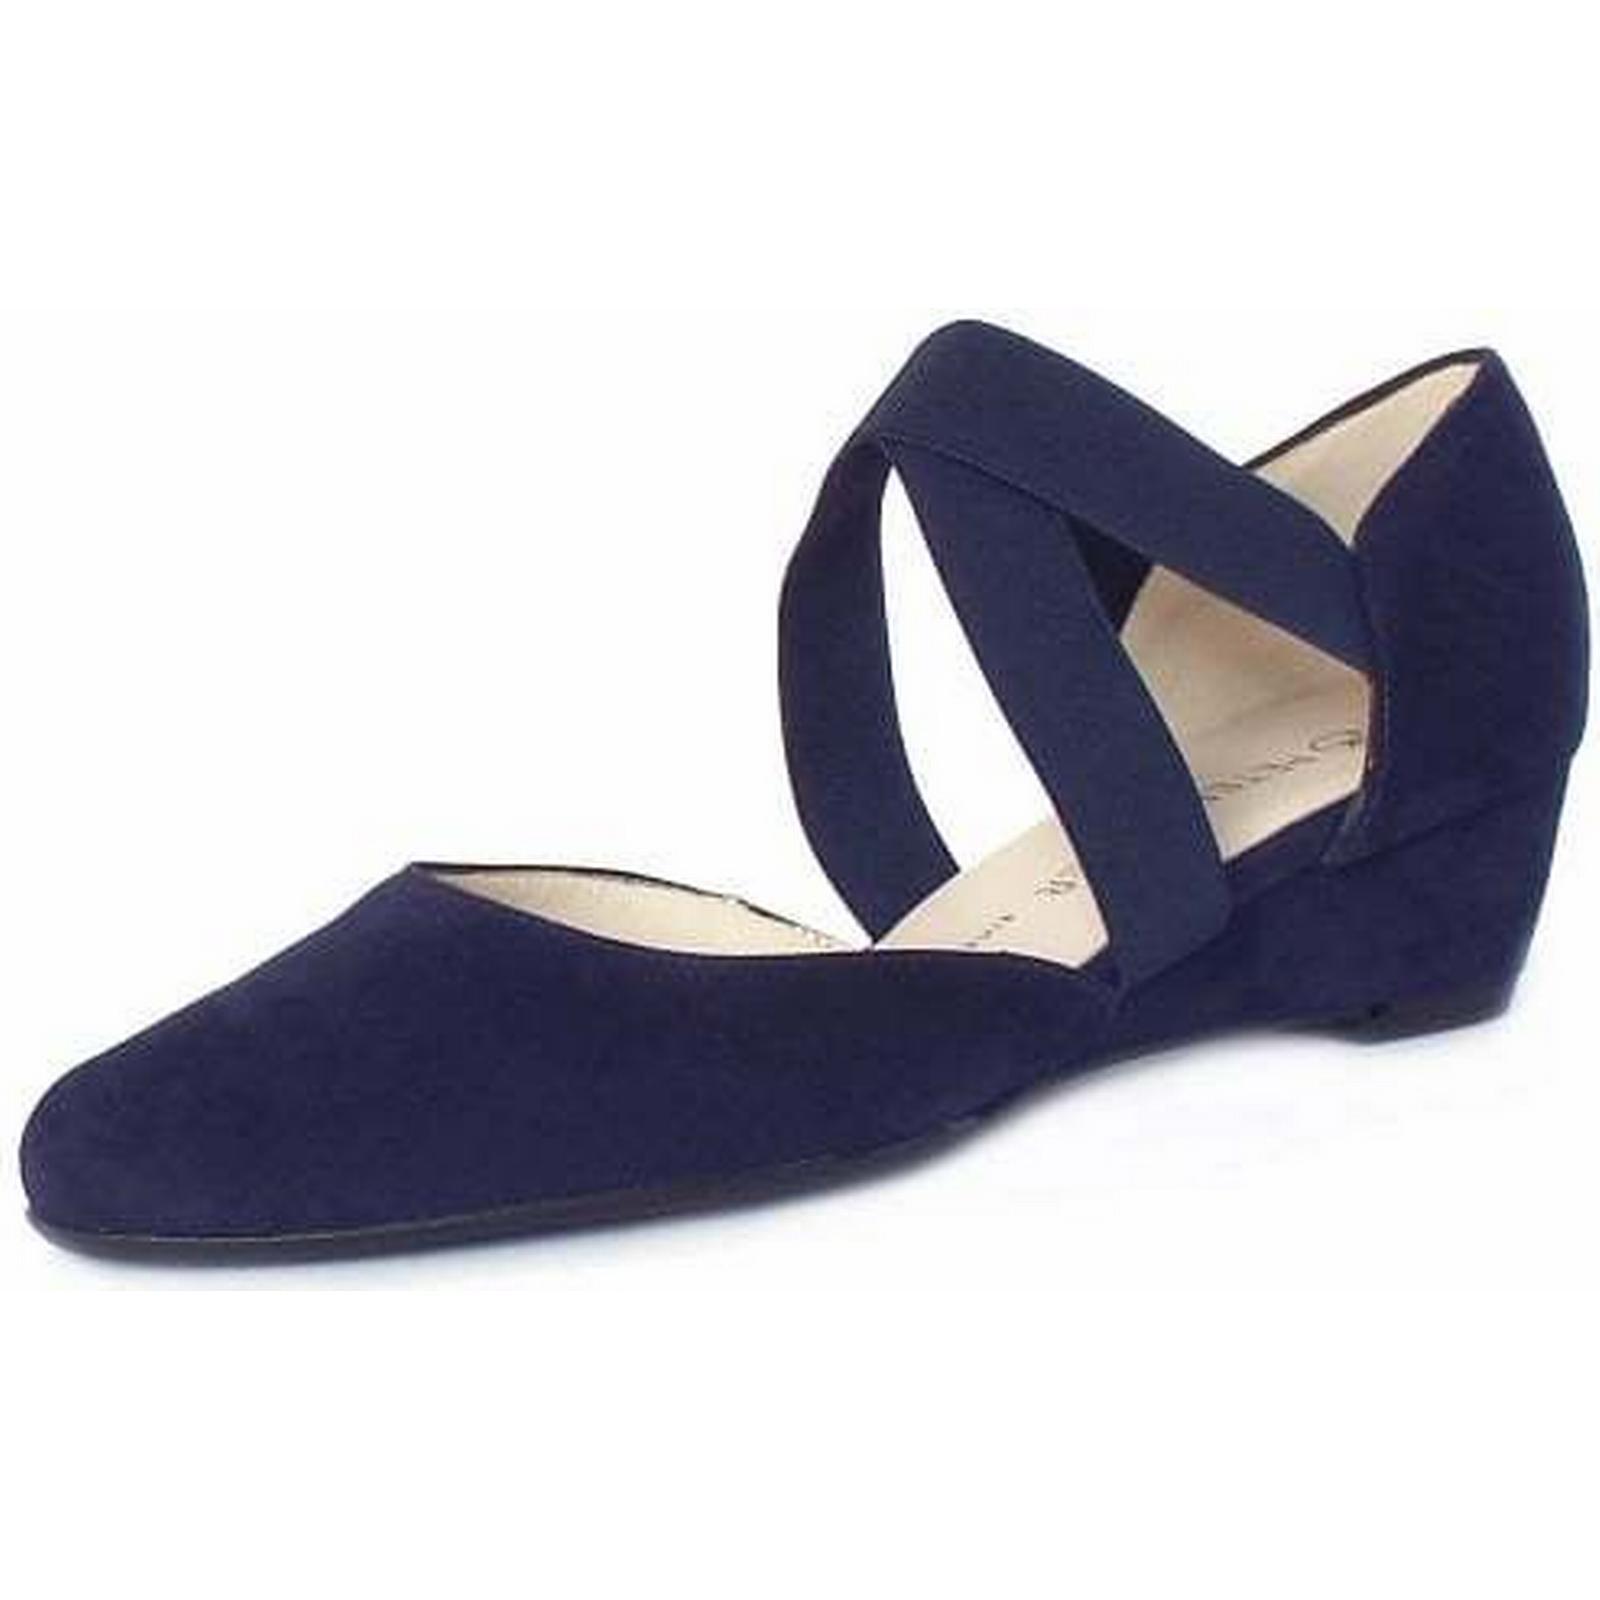 peter kaiser jaila peter kaiser mesdames chaussures chaussures chaussures taille: 5, couleur: marine sue a59622